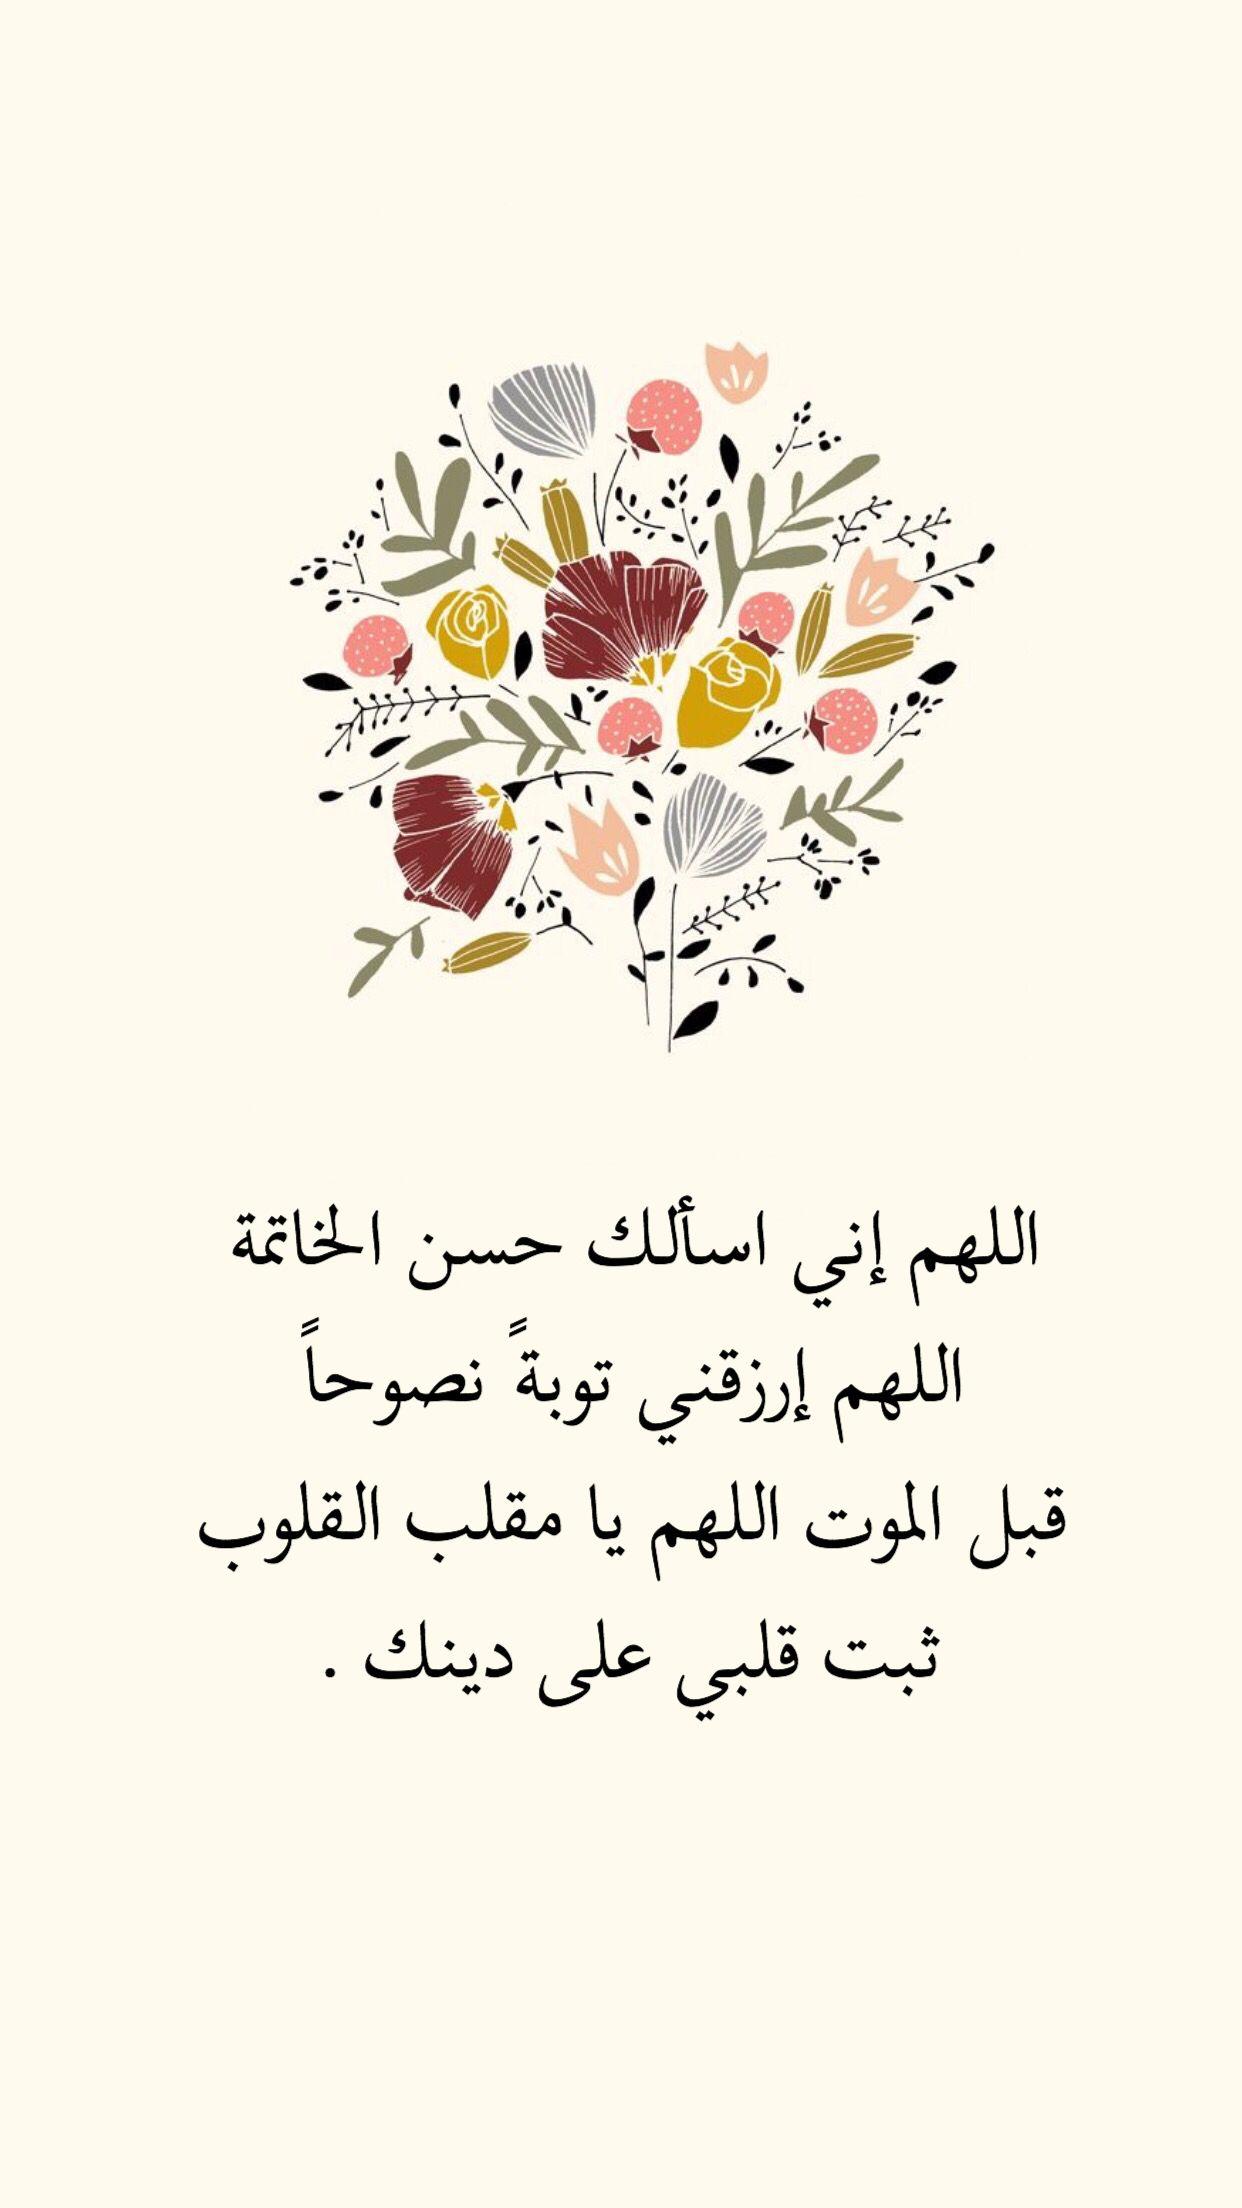 Pin By Amr Bahgat On ذكر و دعاء Islamic Quotes Wallpaper Arabic Quotes Islamic Quotes